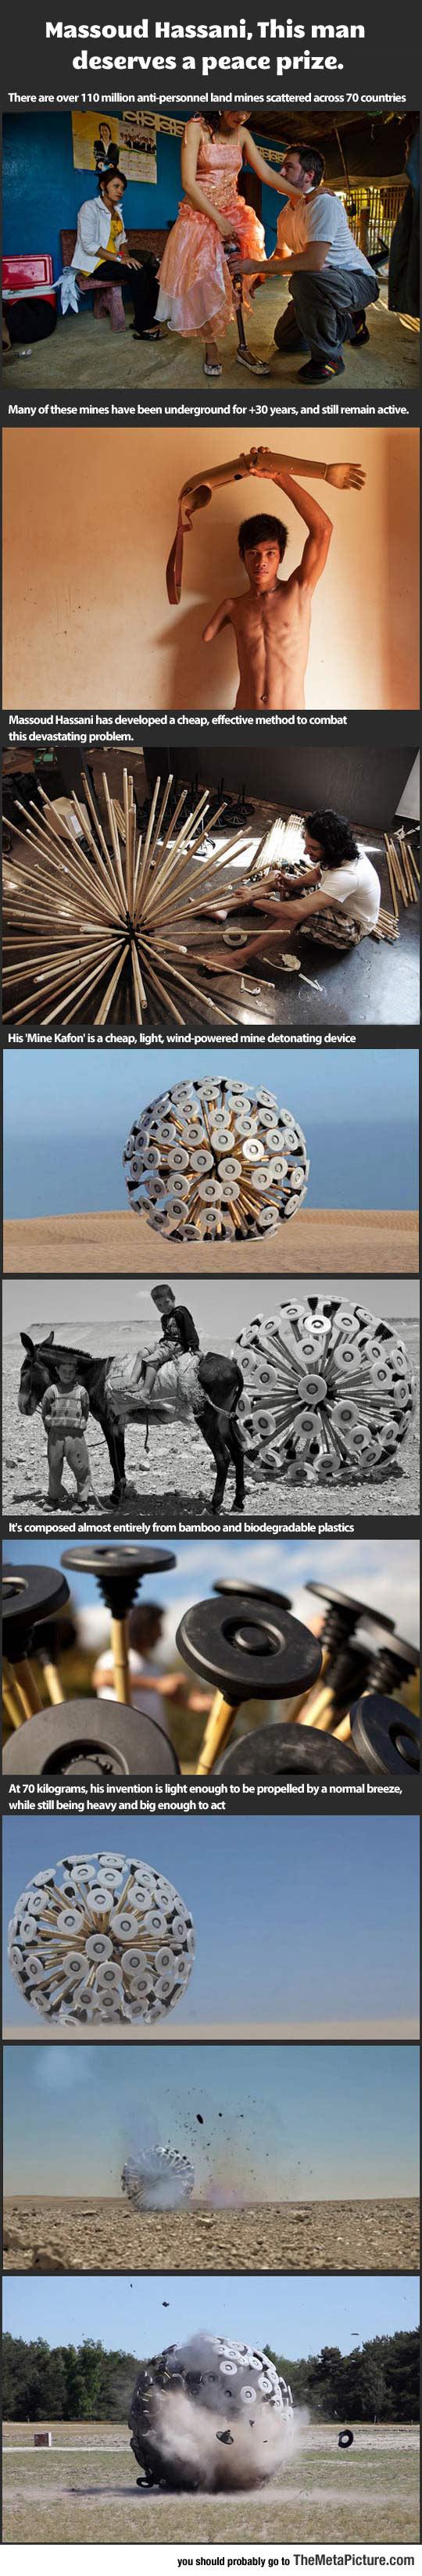 mines-detonator-device-invention